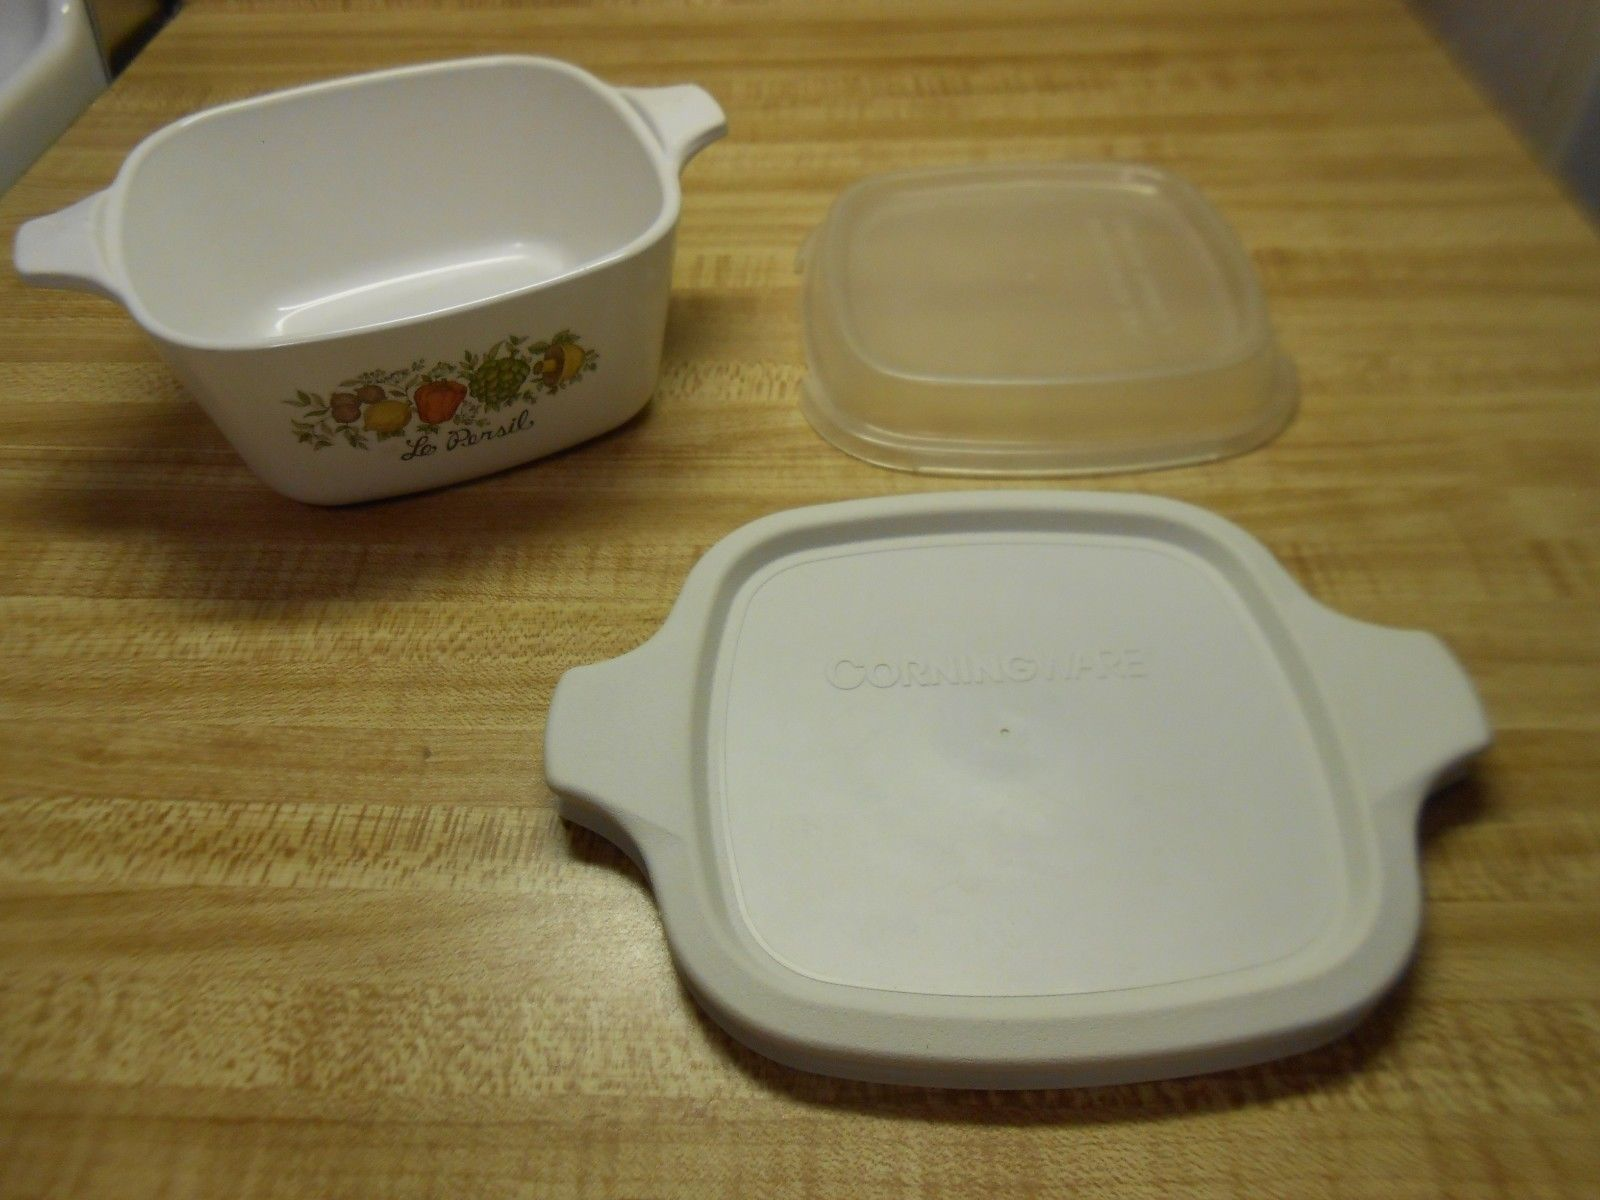 Corningware Casserole Dish 1 customer review and 7 listings